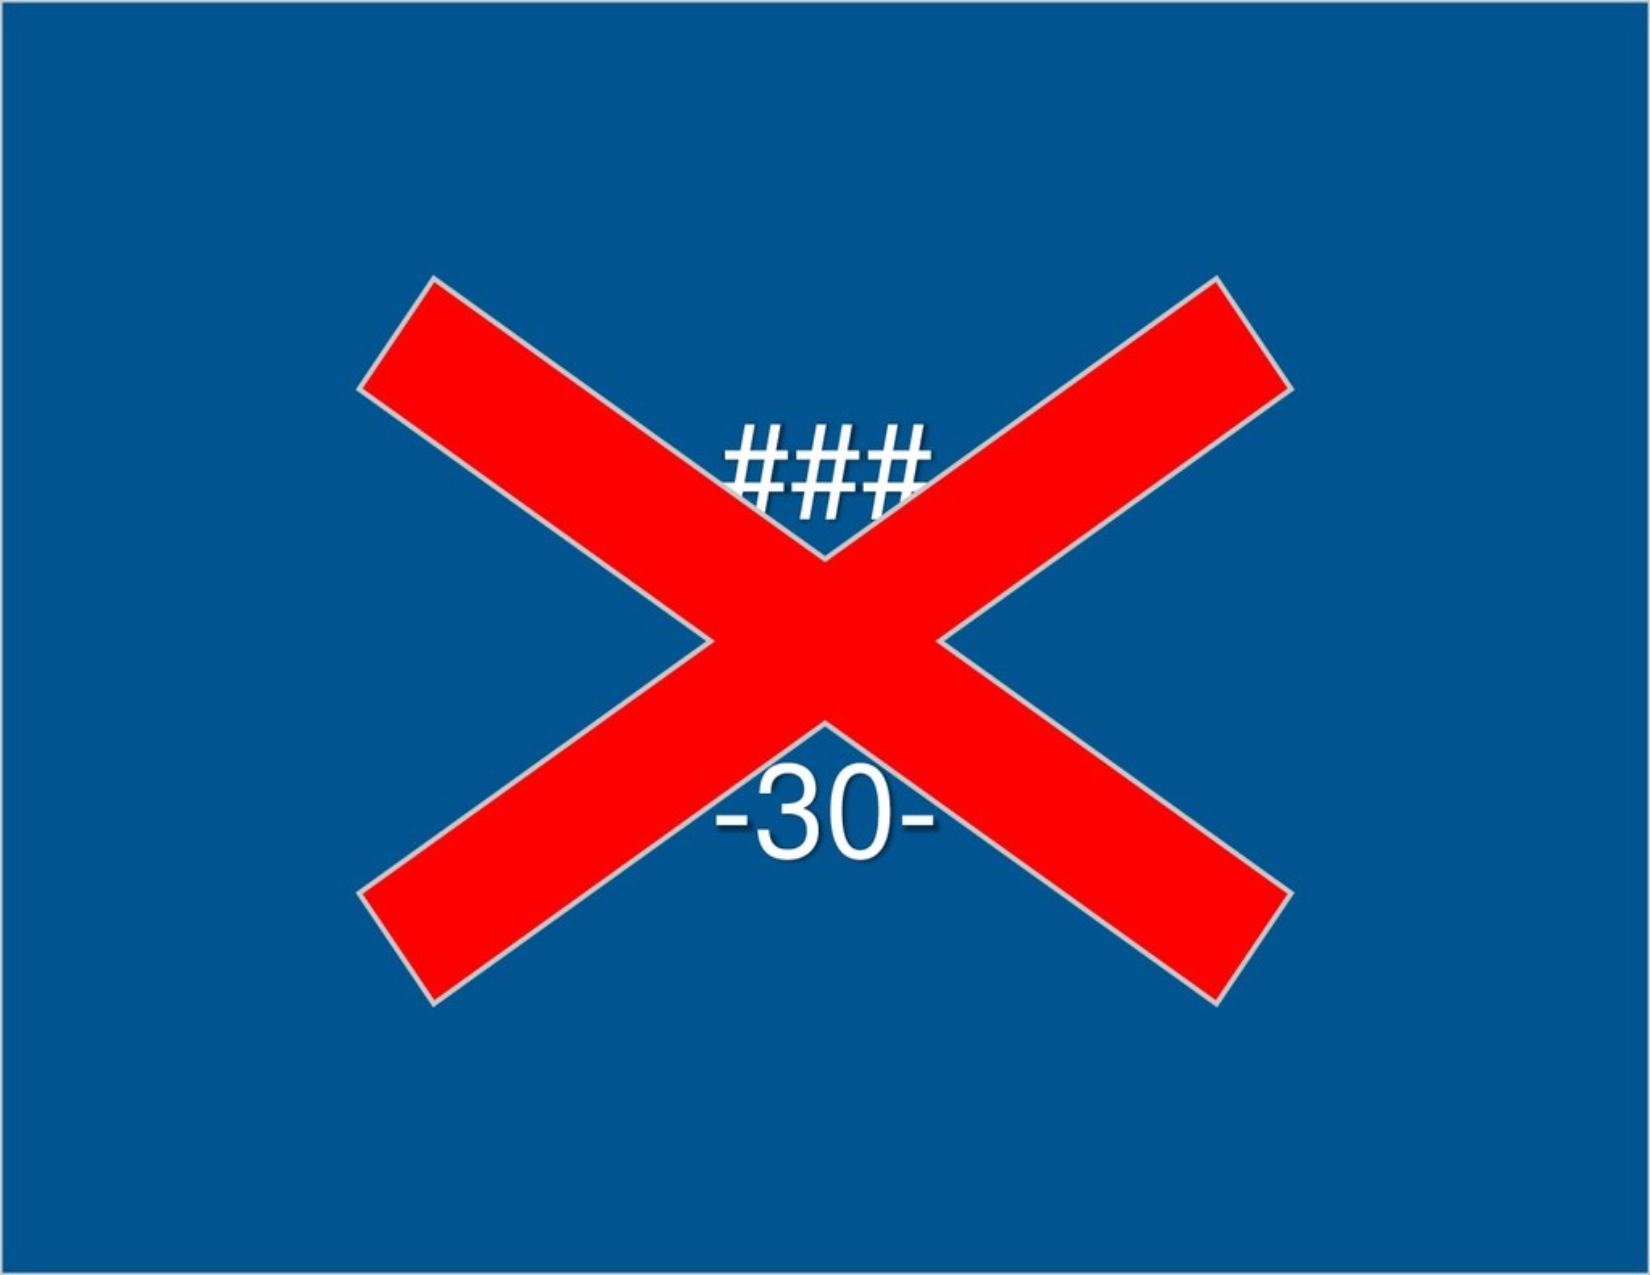 ### or -30-